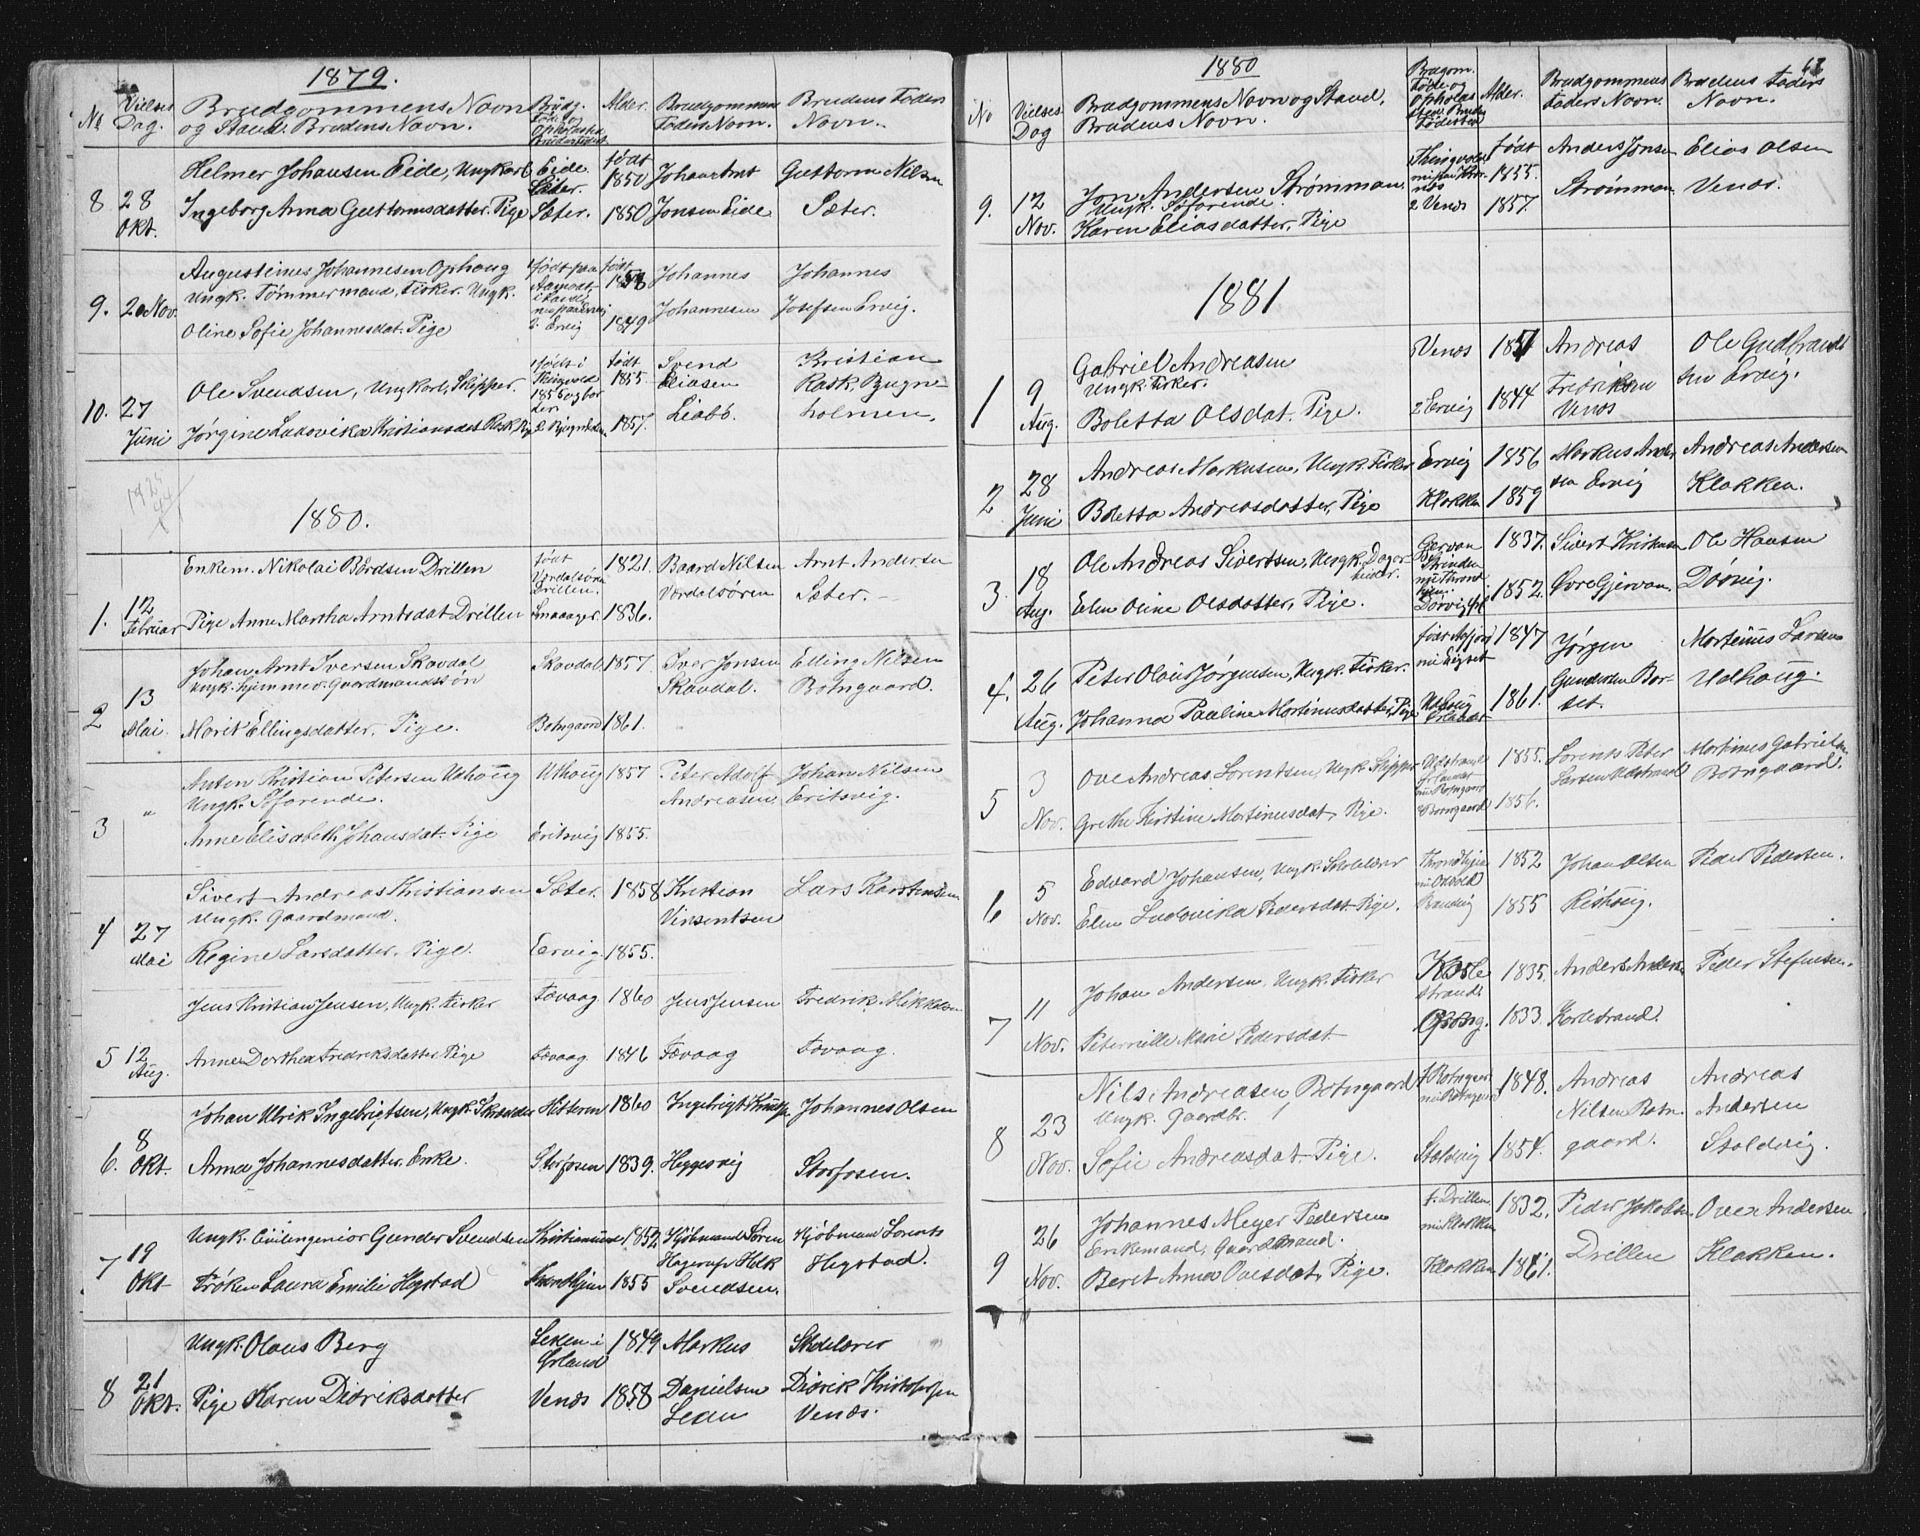 SAT, Ministerialprotokoller, klokkerbøker og fødselsregistre - Sør-Trøndelag, 651/L0647: Parish register (copy) no. 651C01, 1866-1914, p. 66